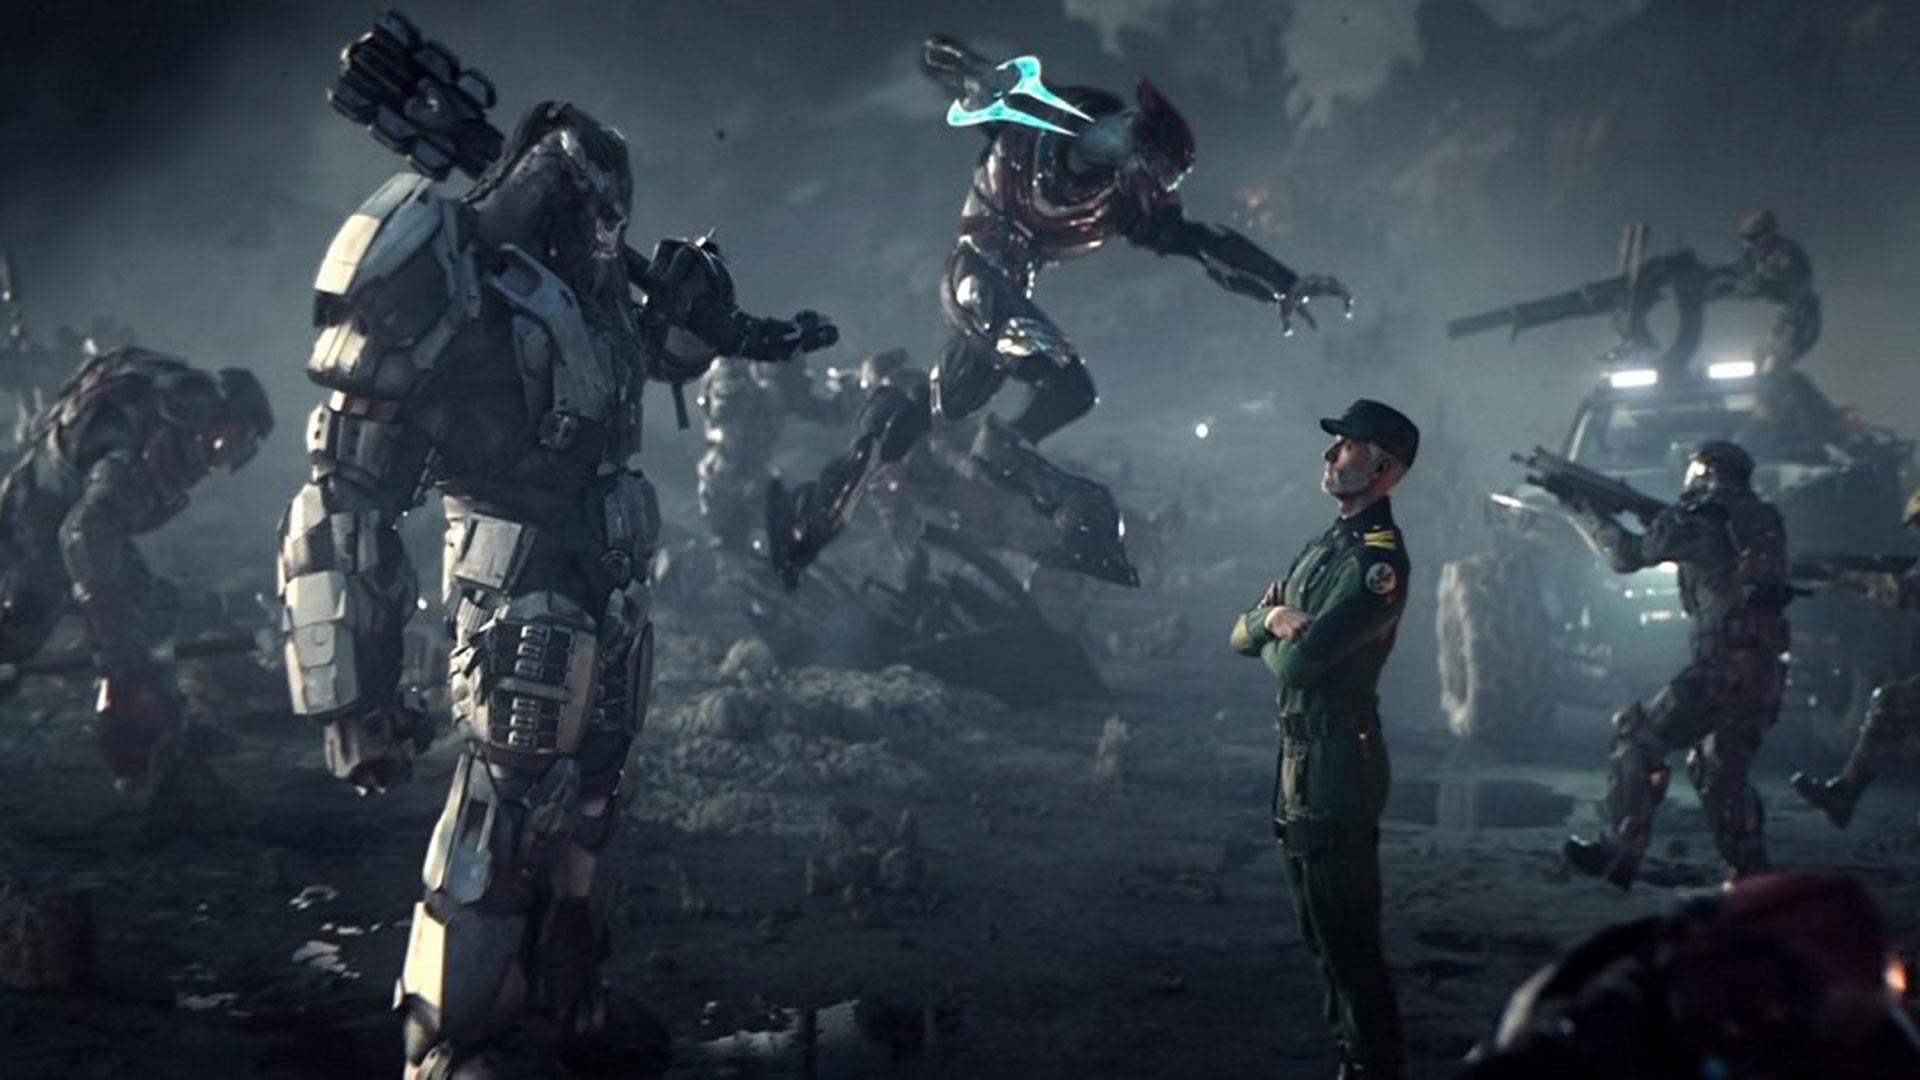 … Halo Wars 2 1080p Wallpaper …